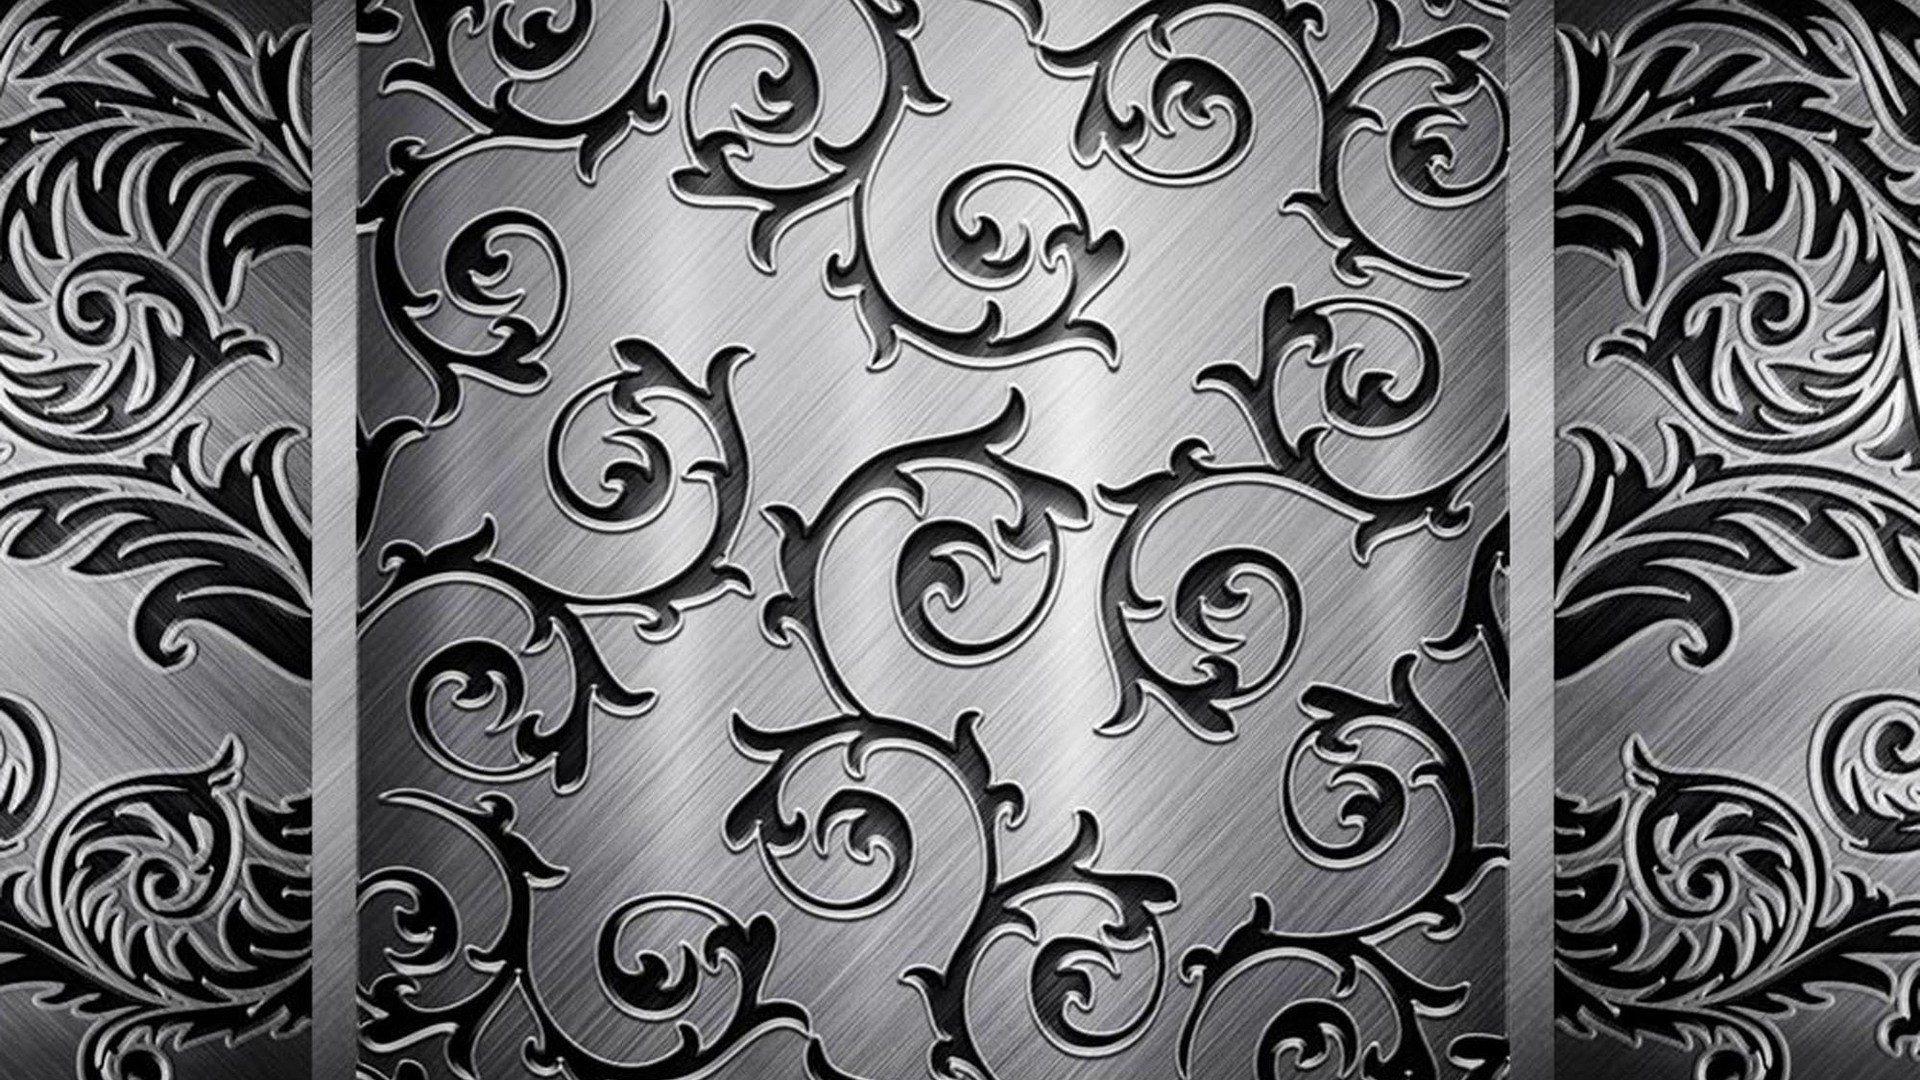 white and black wallpaper designs 20 cool hd wallpaper. Black Bedroom Furniture Sets. Home Design Ideas